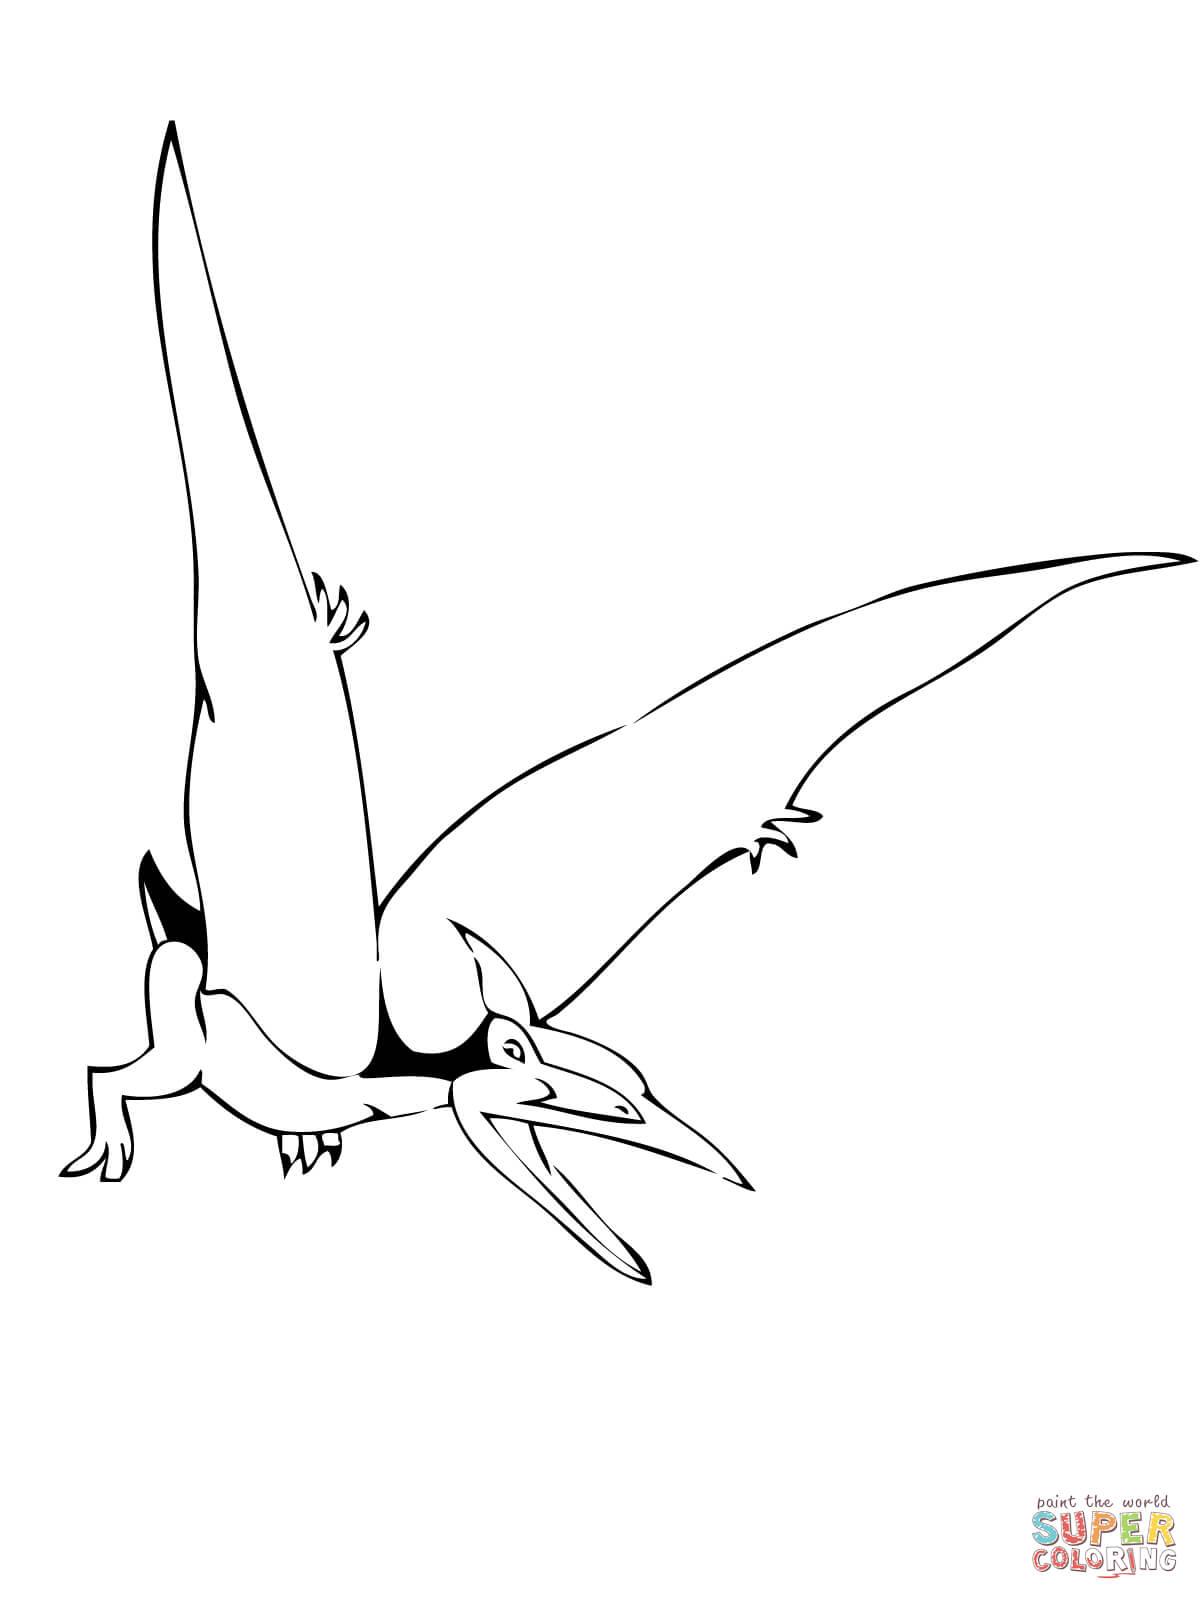 pterodactyl drawing at getdrawings free